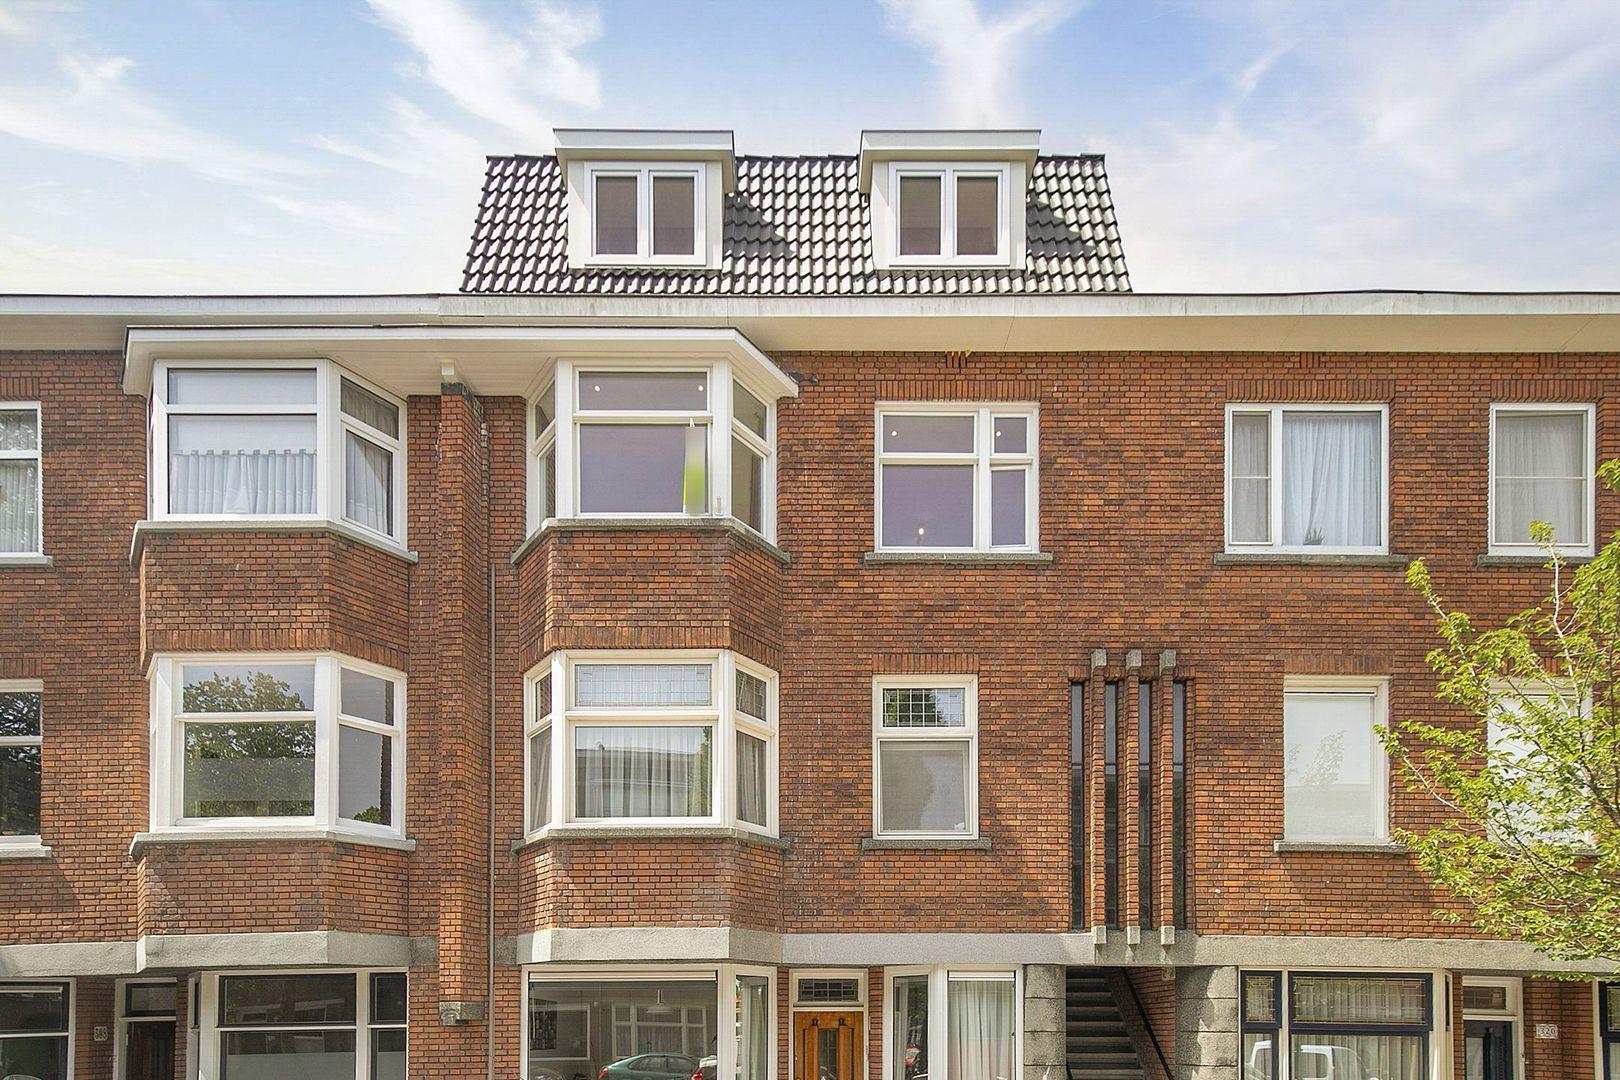 Stuyvesantstraat 314, Den Haag